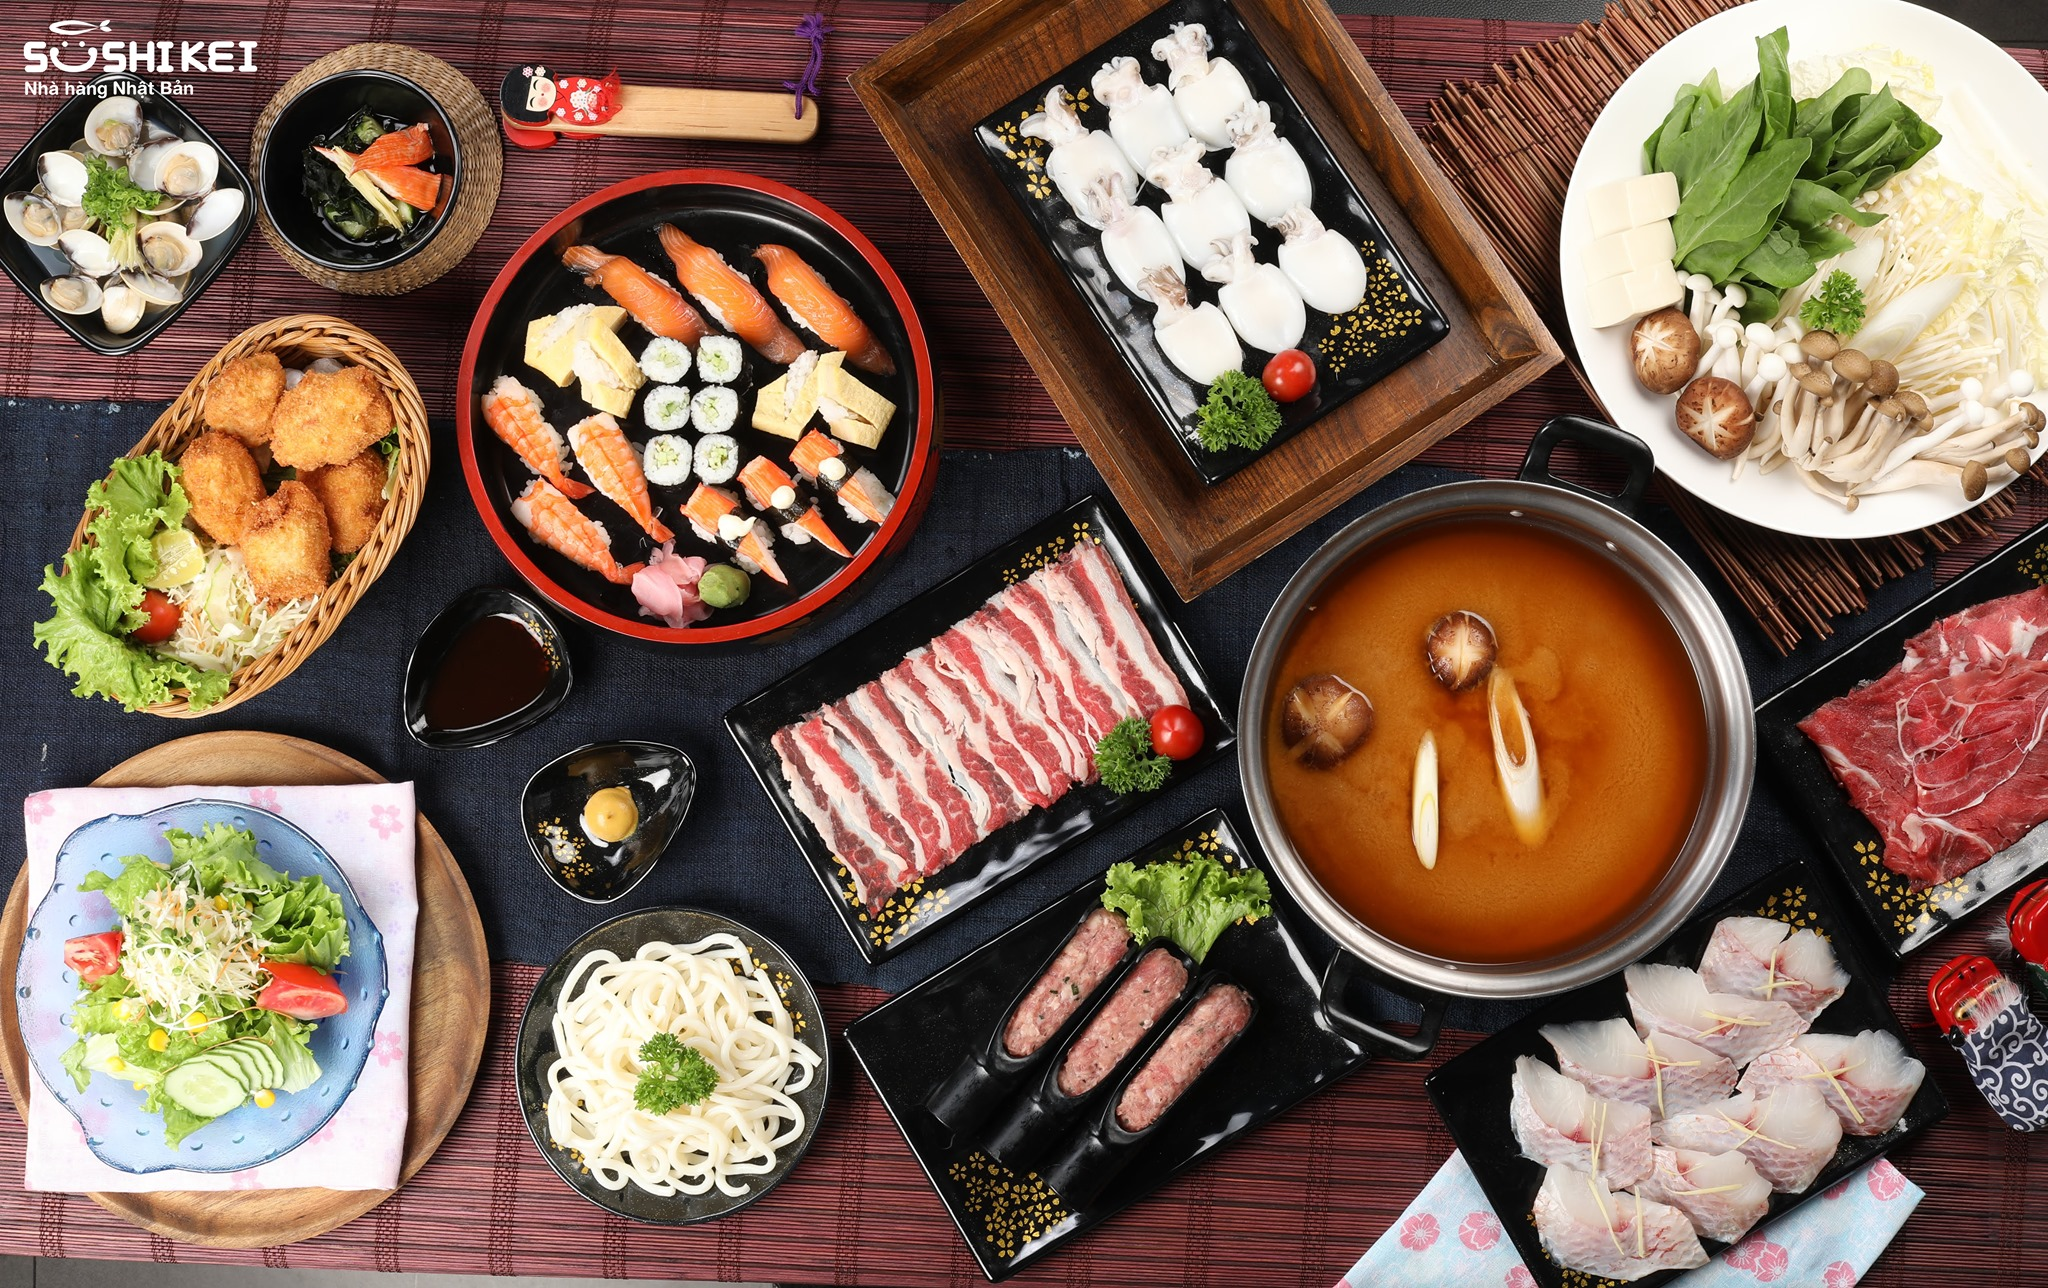 Menu Sushi Kei